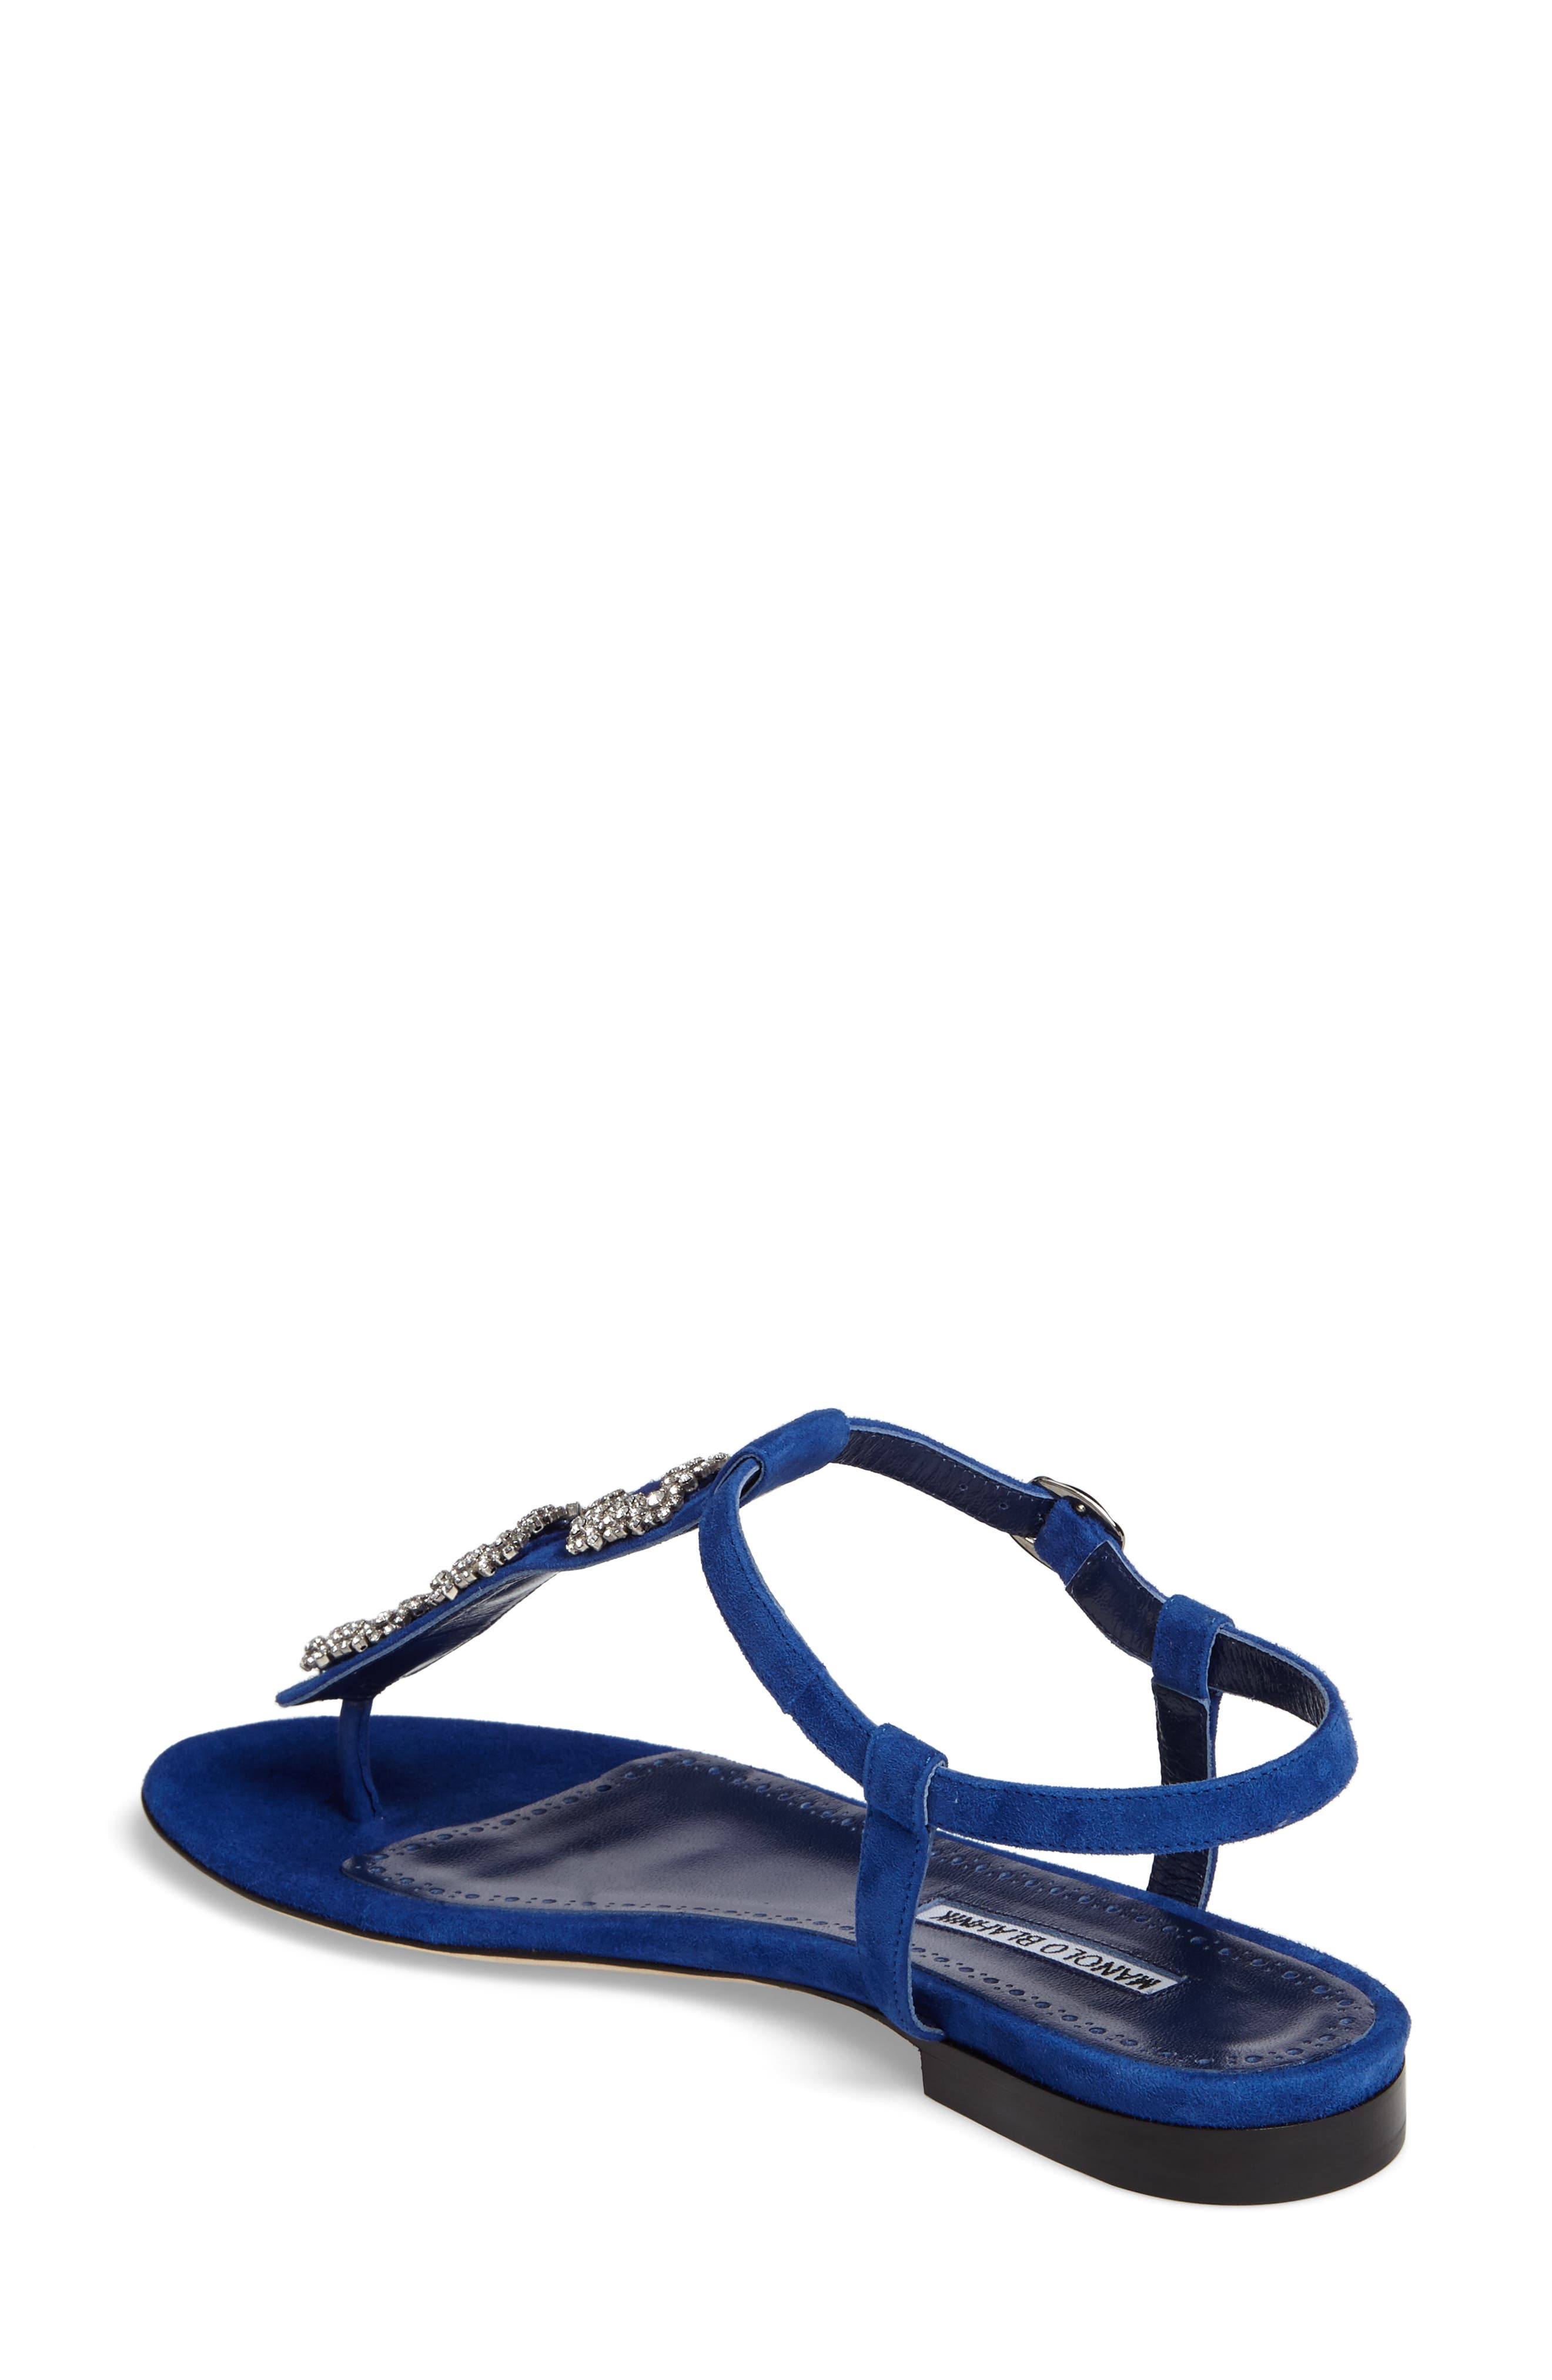 Ottolina T-Strap Sandal,                             Alternate thumbnail 2, color,                             Blue Suede